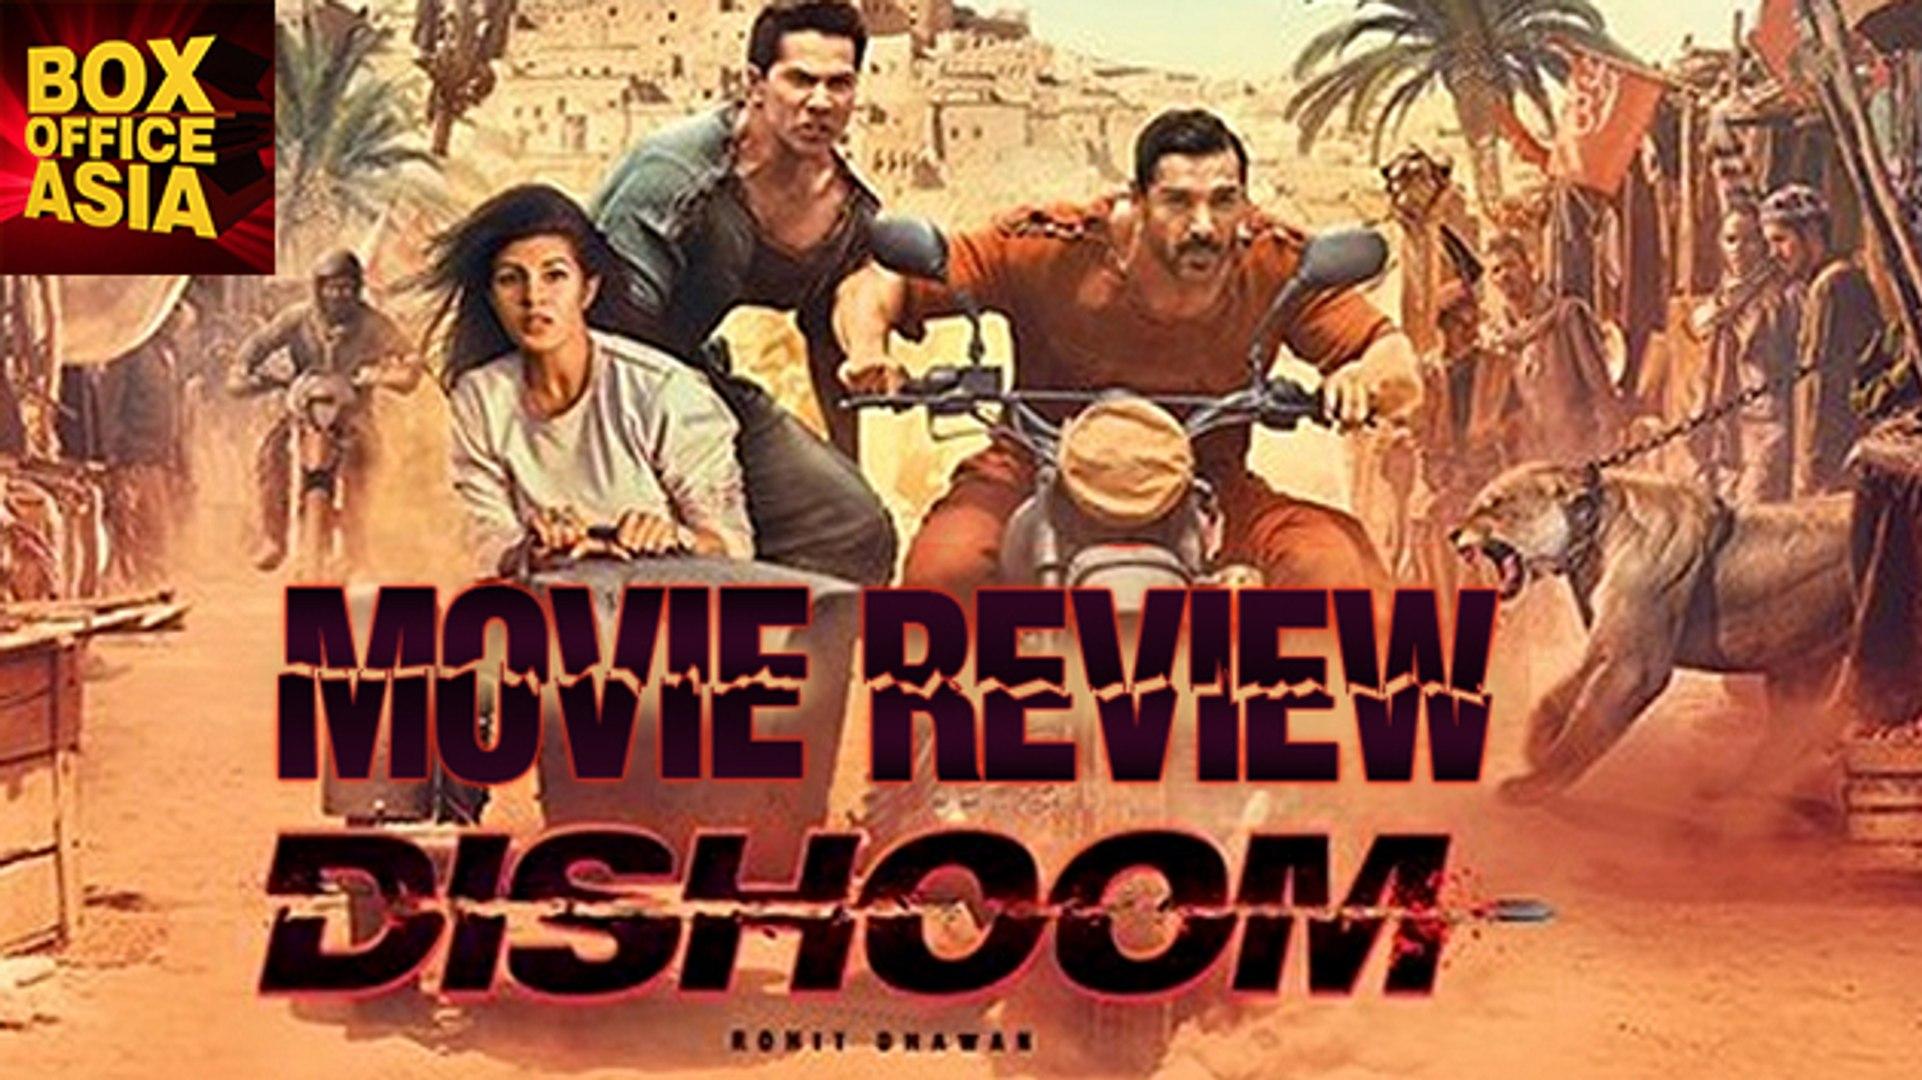 Dishoom Movie Review Varun Dhawan John Abraham Jacqueline Fernandez Box Office Asia